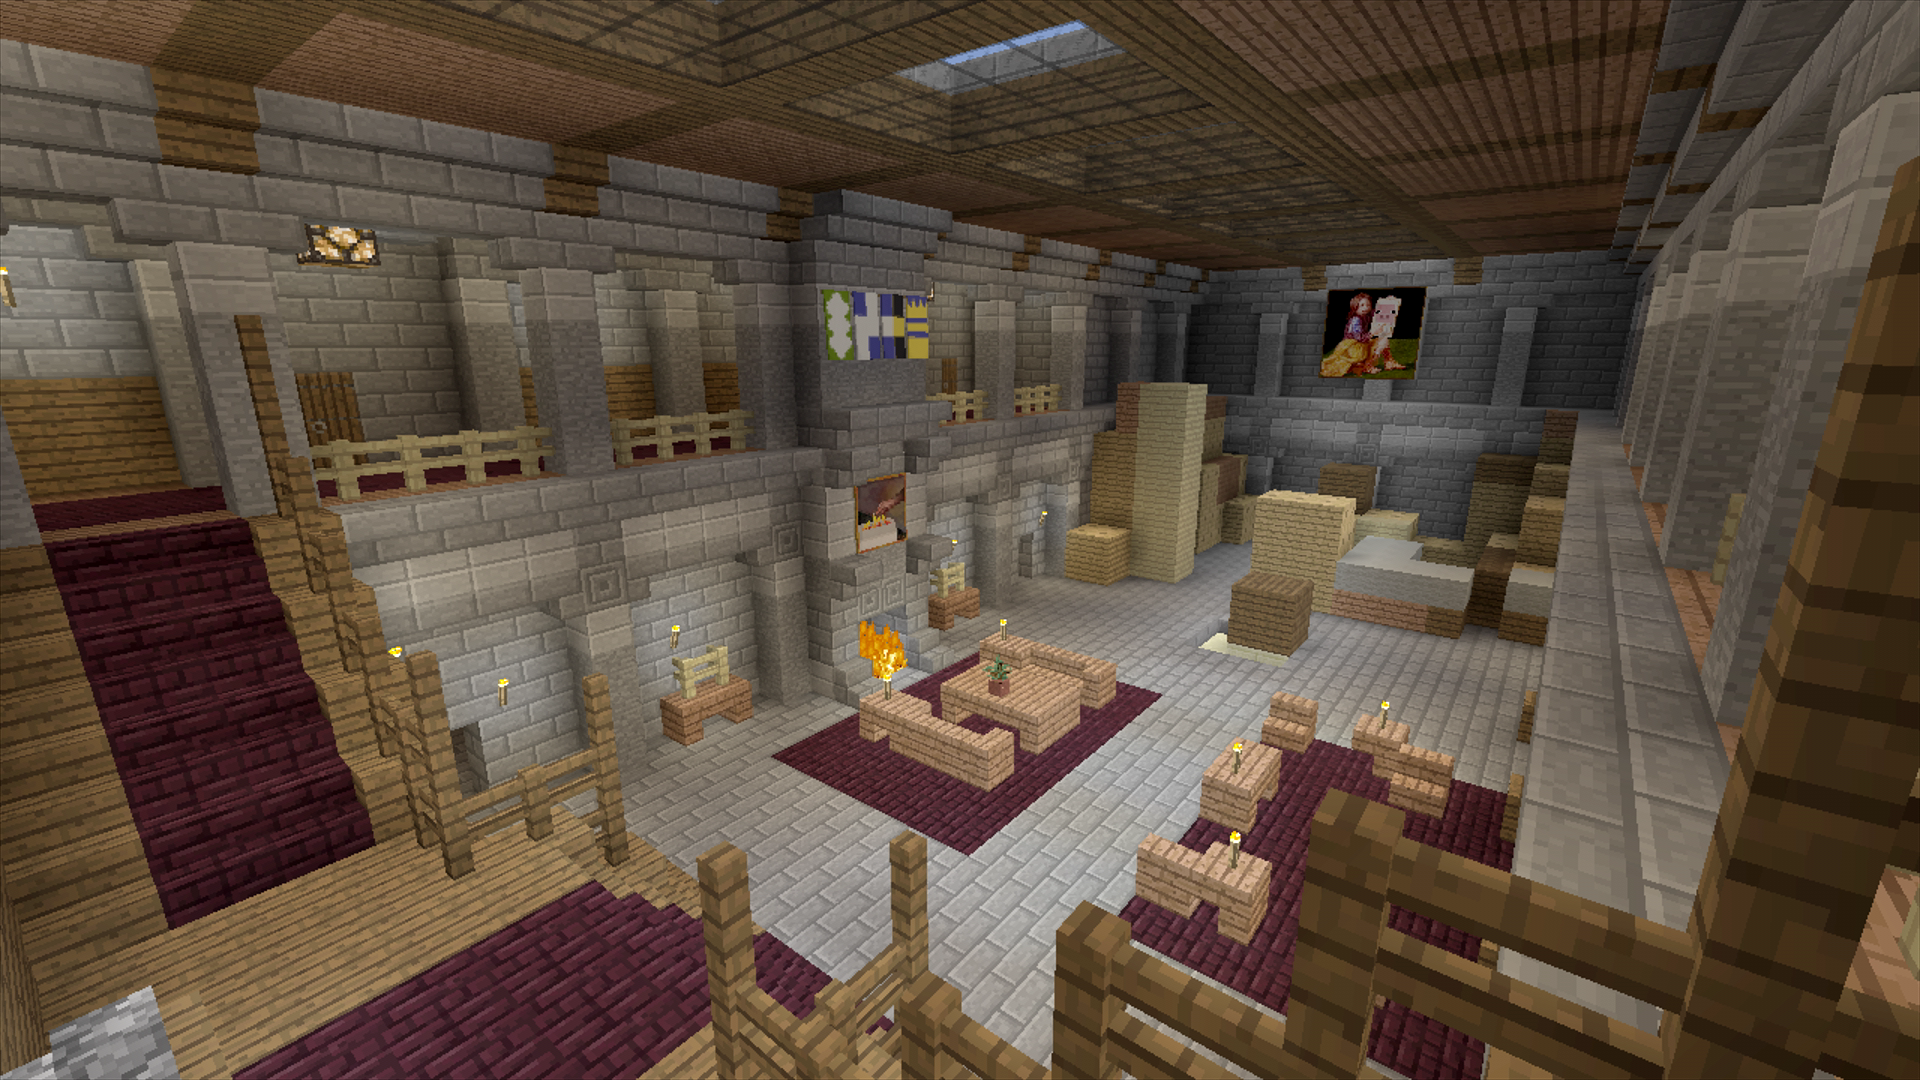 Minecraft Screen Shot 2-16-19, 1.40 PM.png